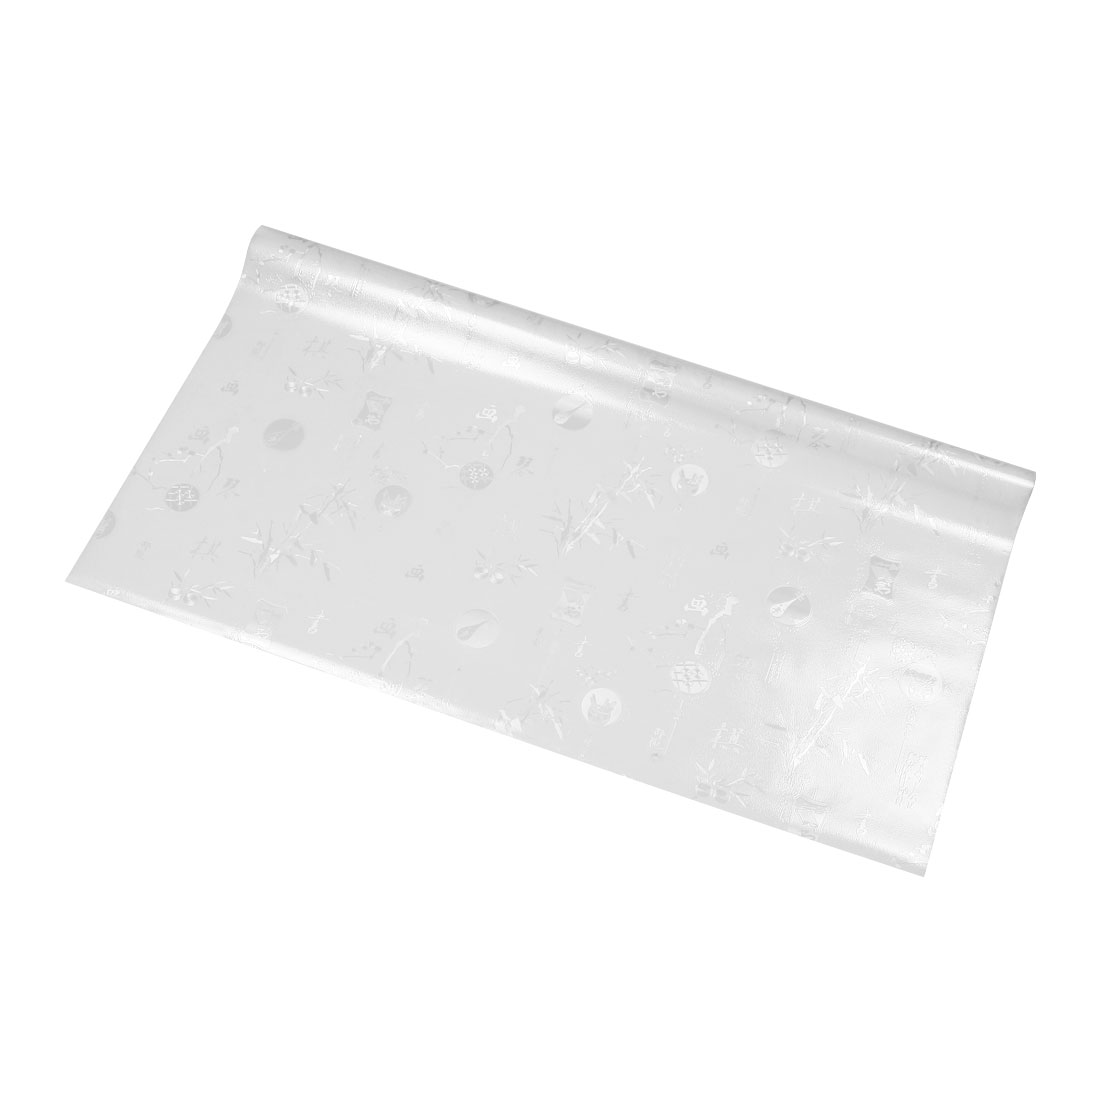 "Bathroom Home 35.4"" x 78.7"" Anti UV Window Film Sticker Chinese Pattern"